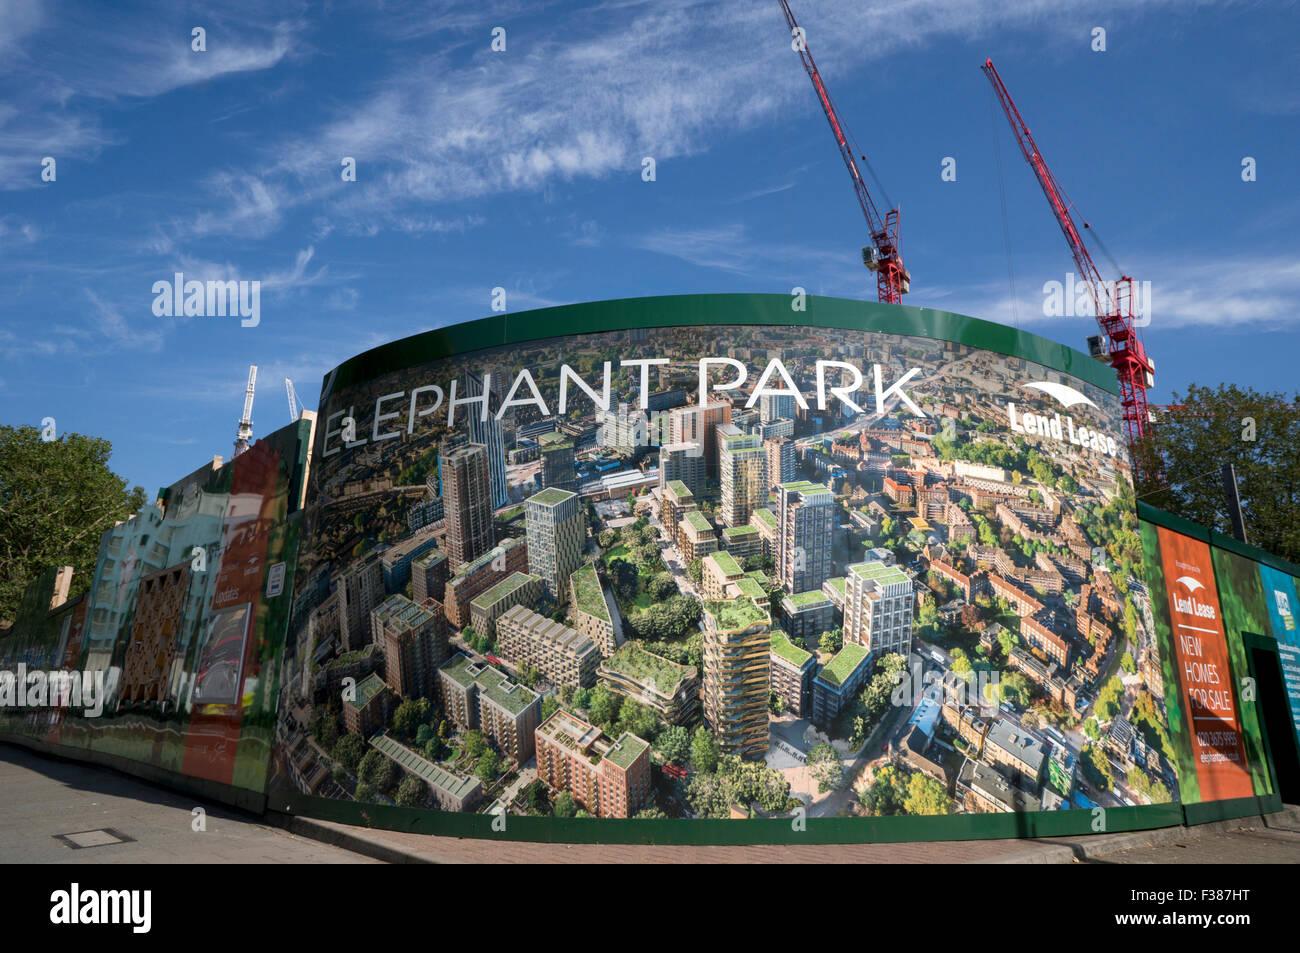 Elephant Park redevelopment - Stock Image